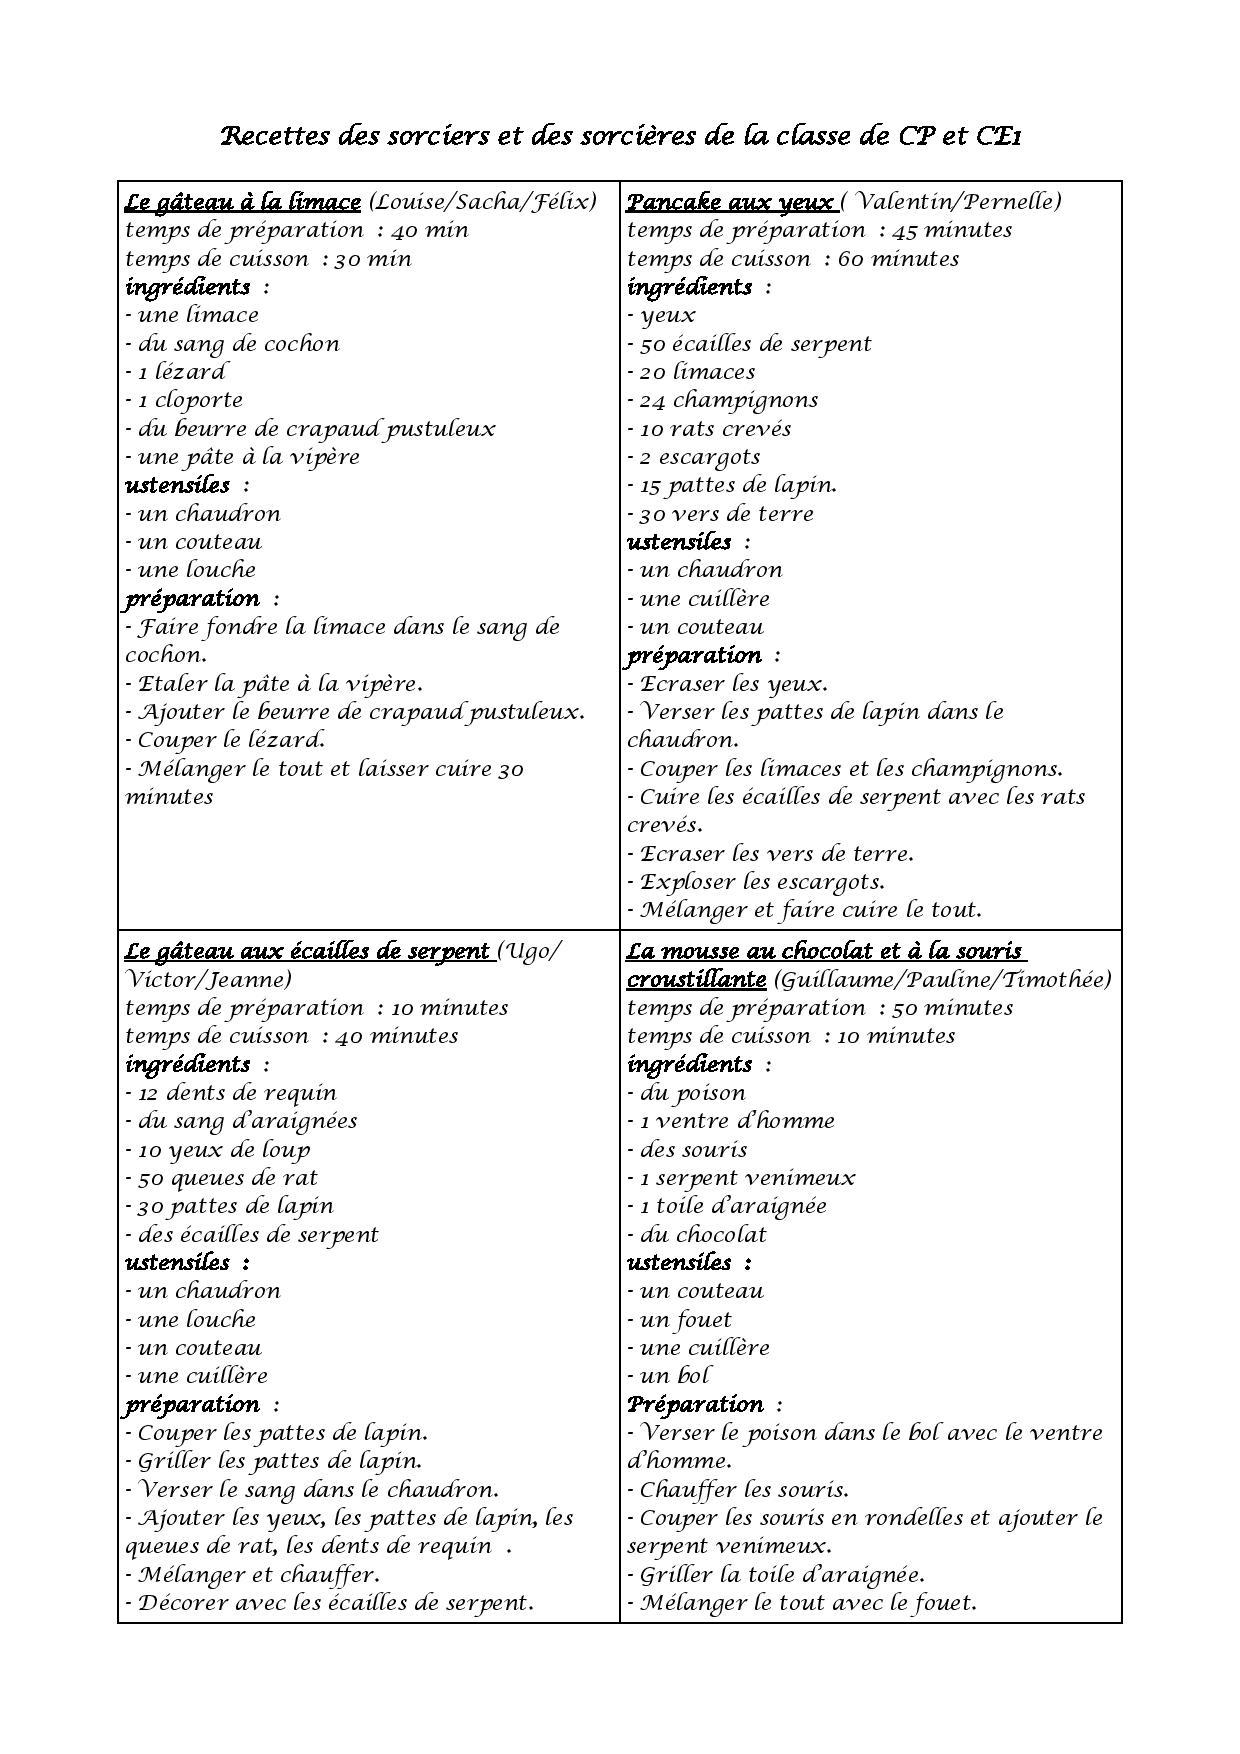 recettes-page-001